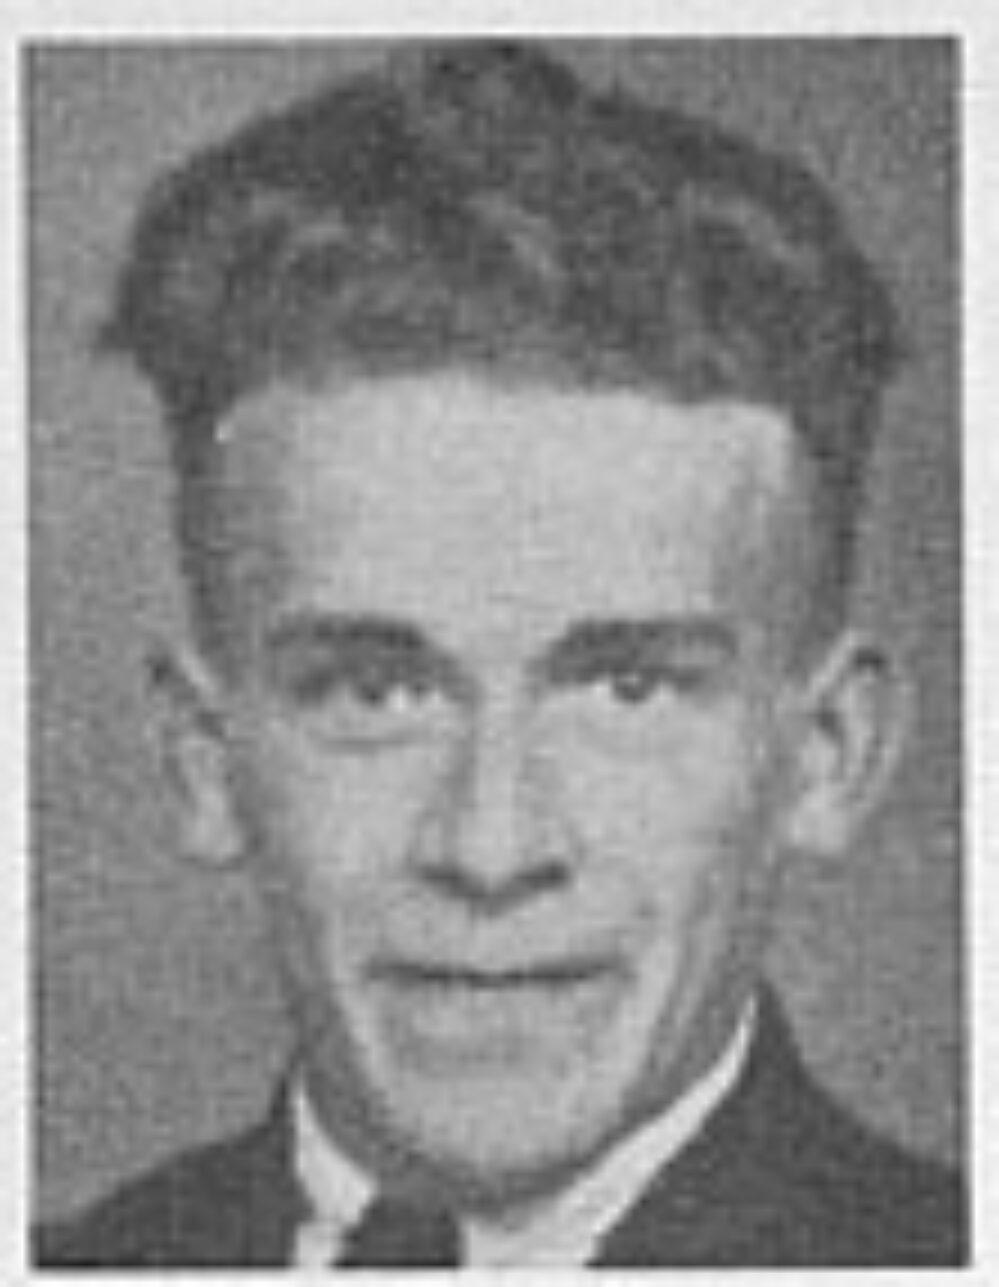 Olav Andreassen Flågøy